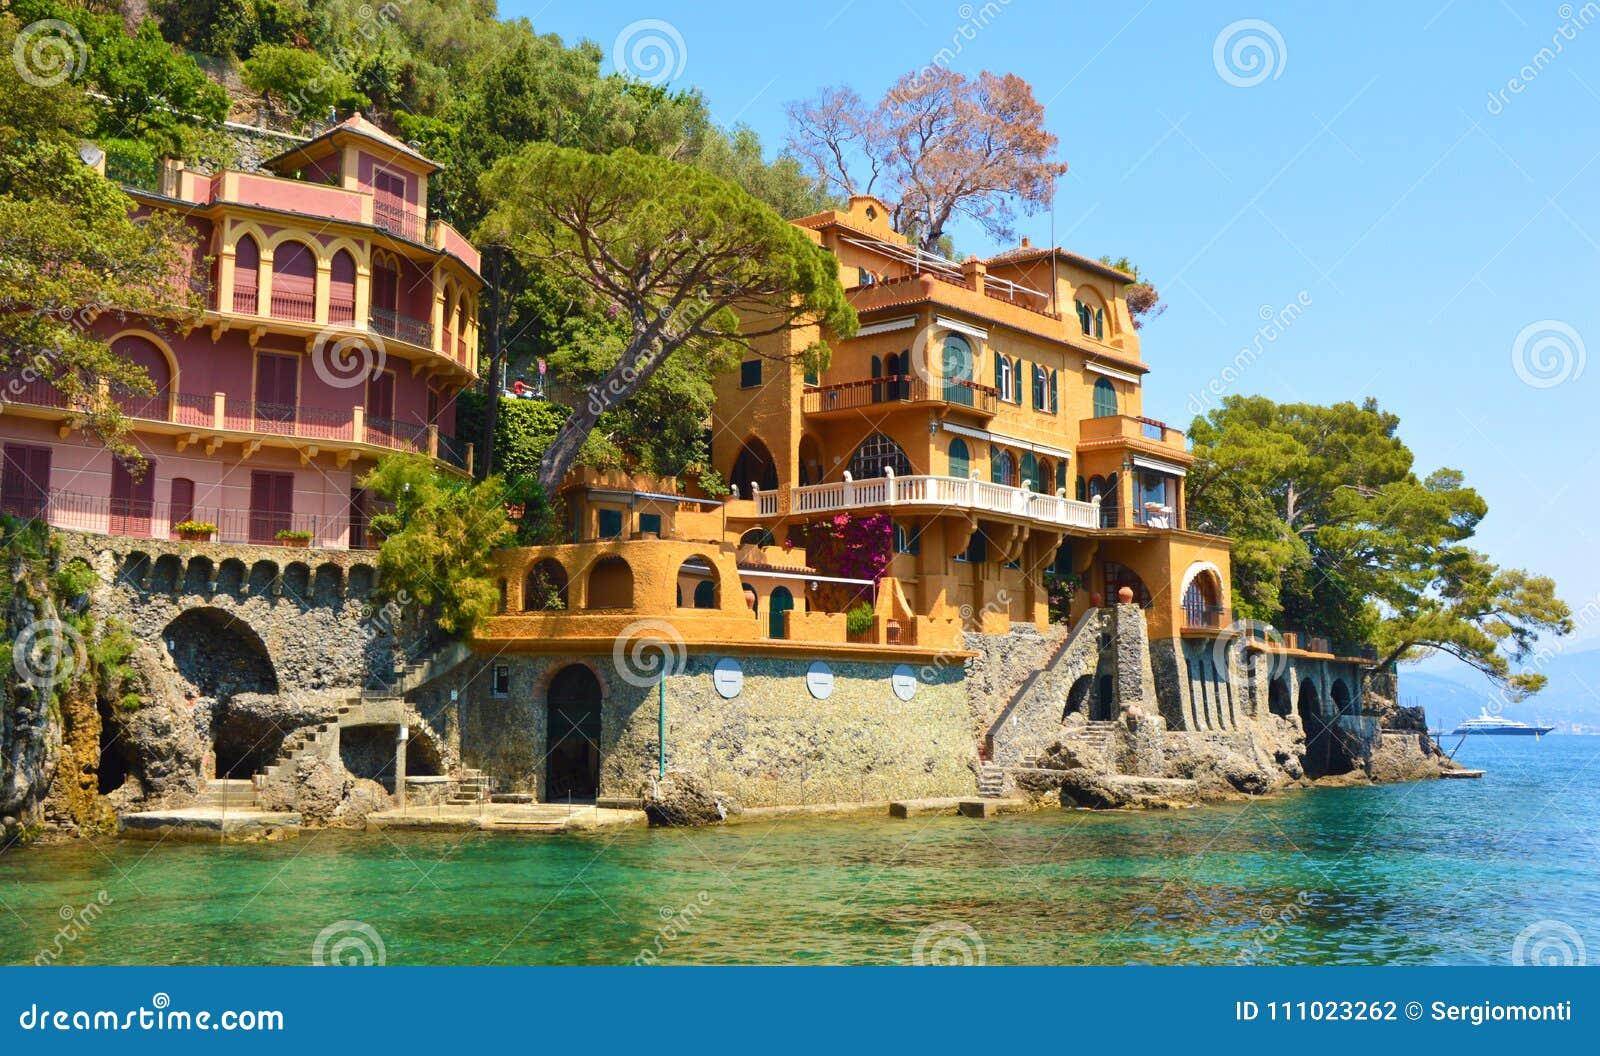 Beautiful Luxury Homes Overlooking On The Portofino Bay, Italy.